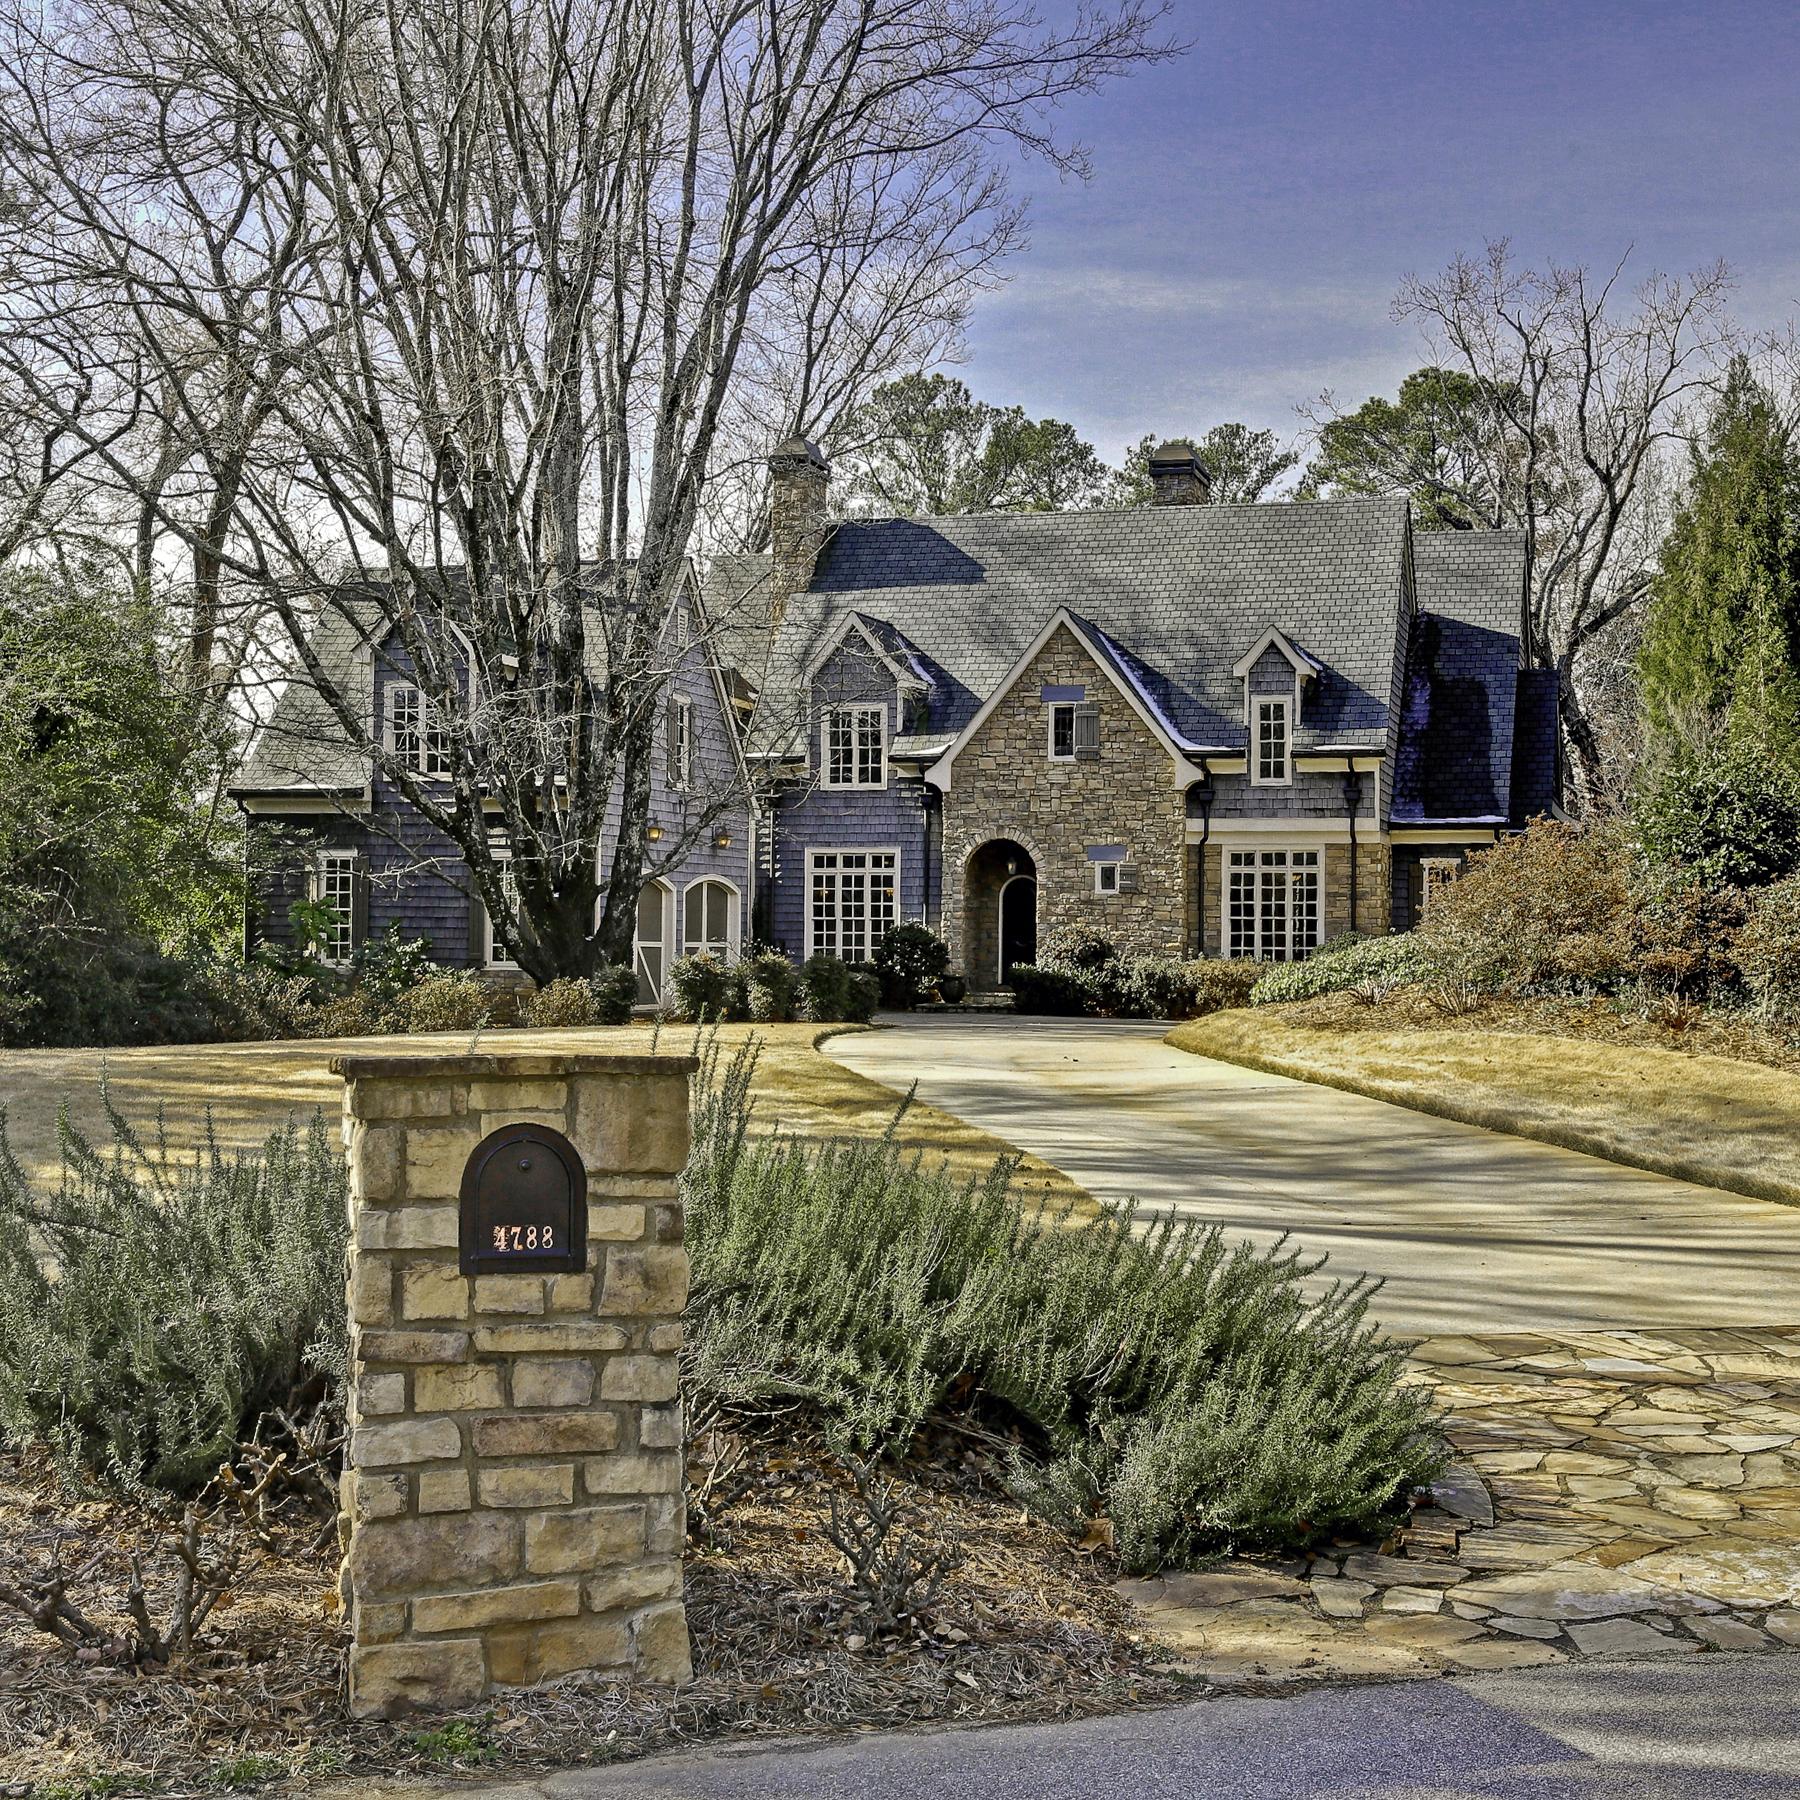 Moradia para Venda às Absolutely Stunning Custom Built Home In Chastain Park Area 4788 Dudley Lane Atlanta, Geórgia, 30327 Estados Unidos